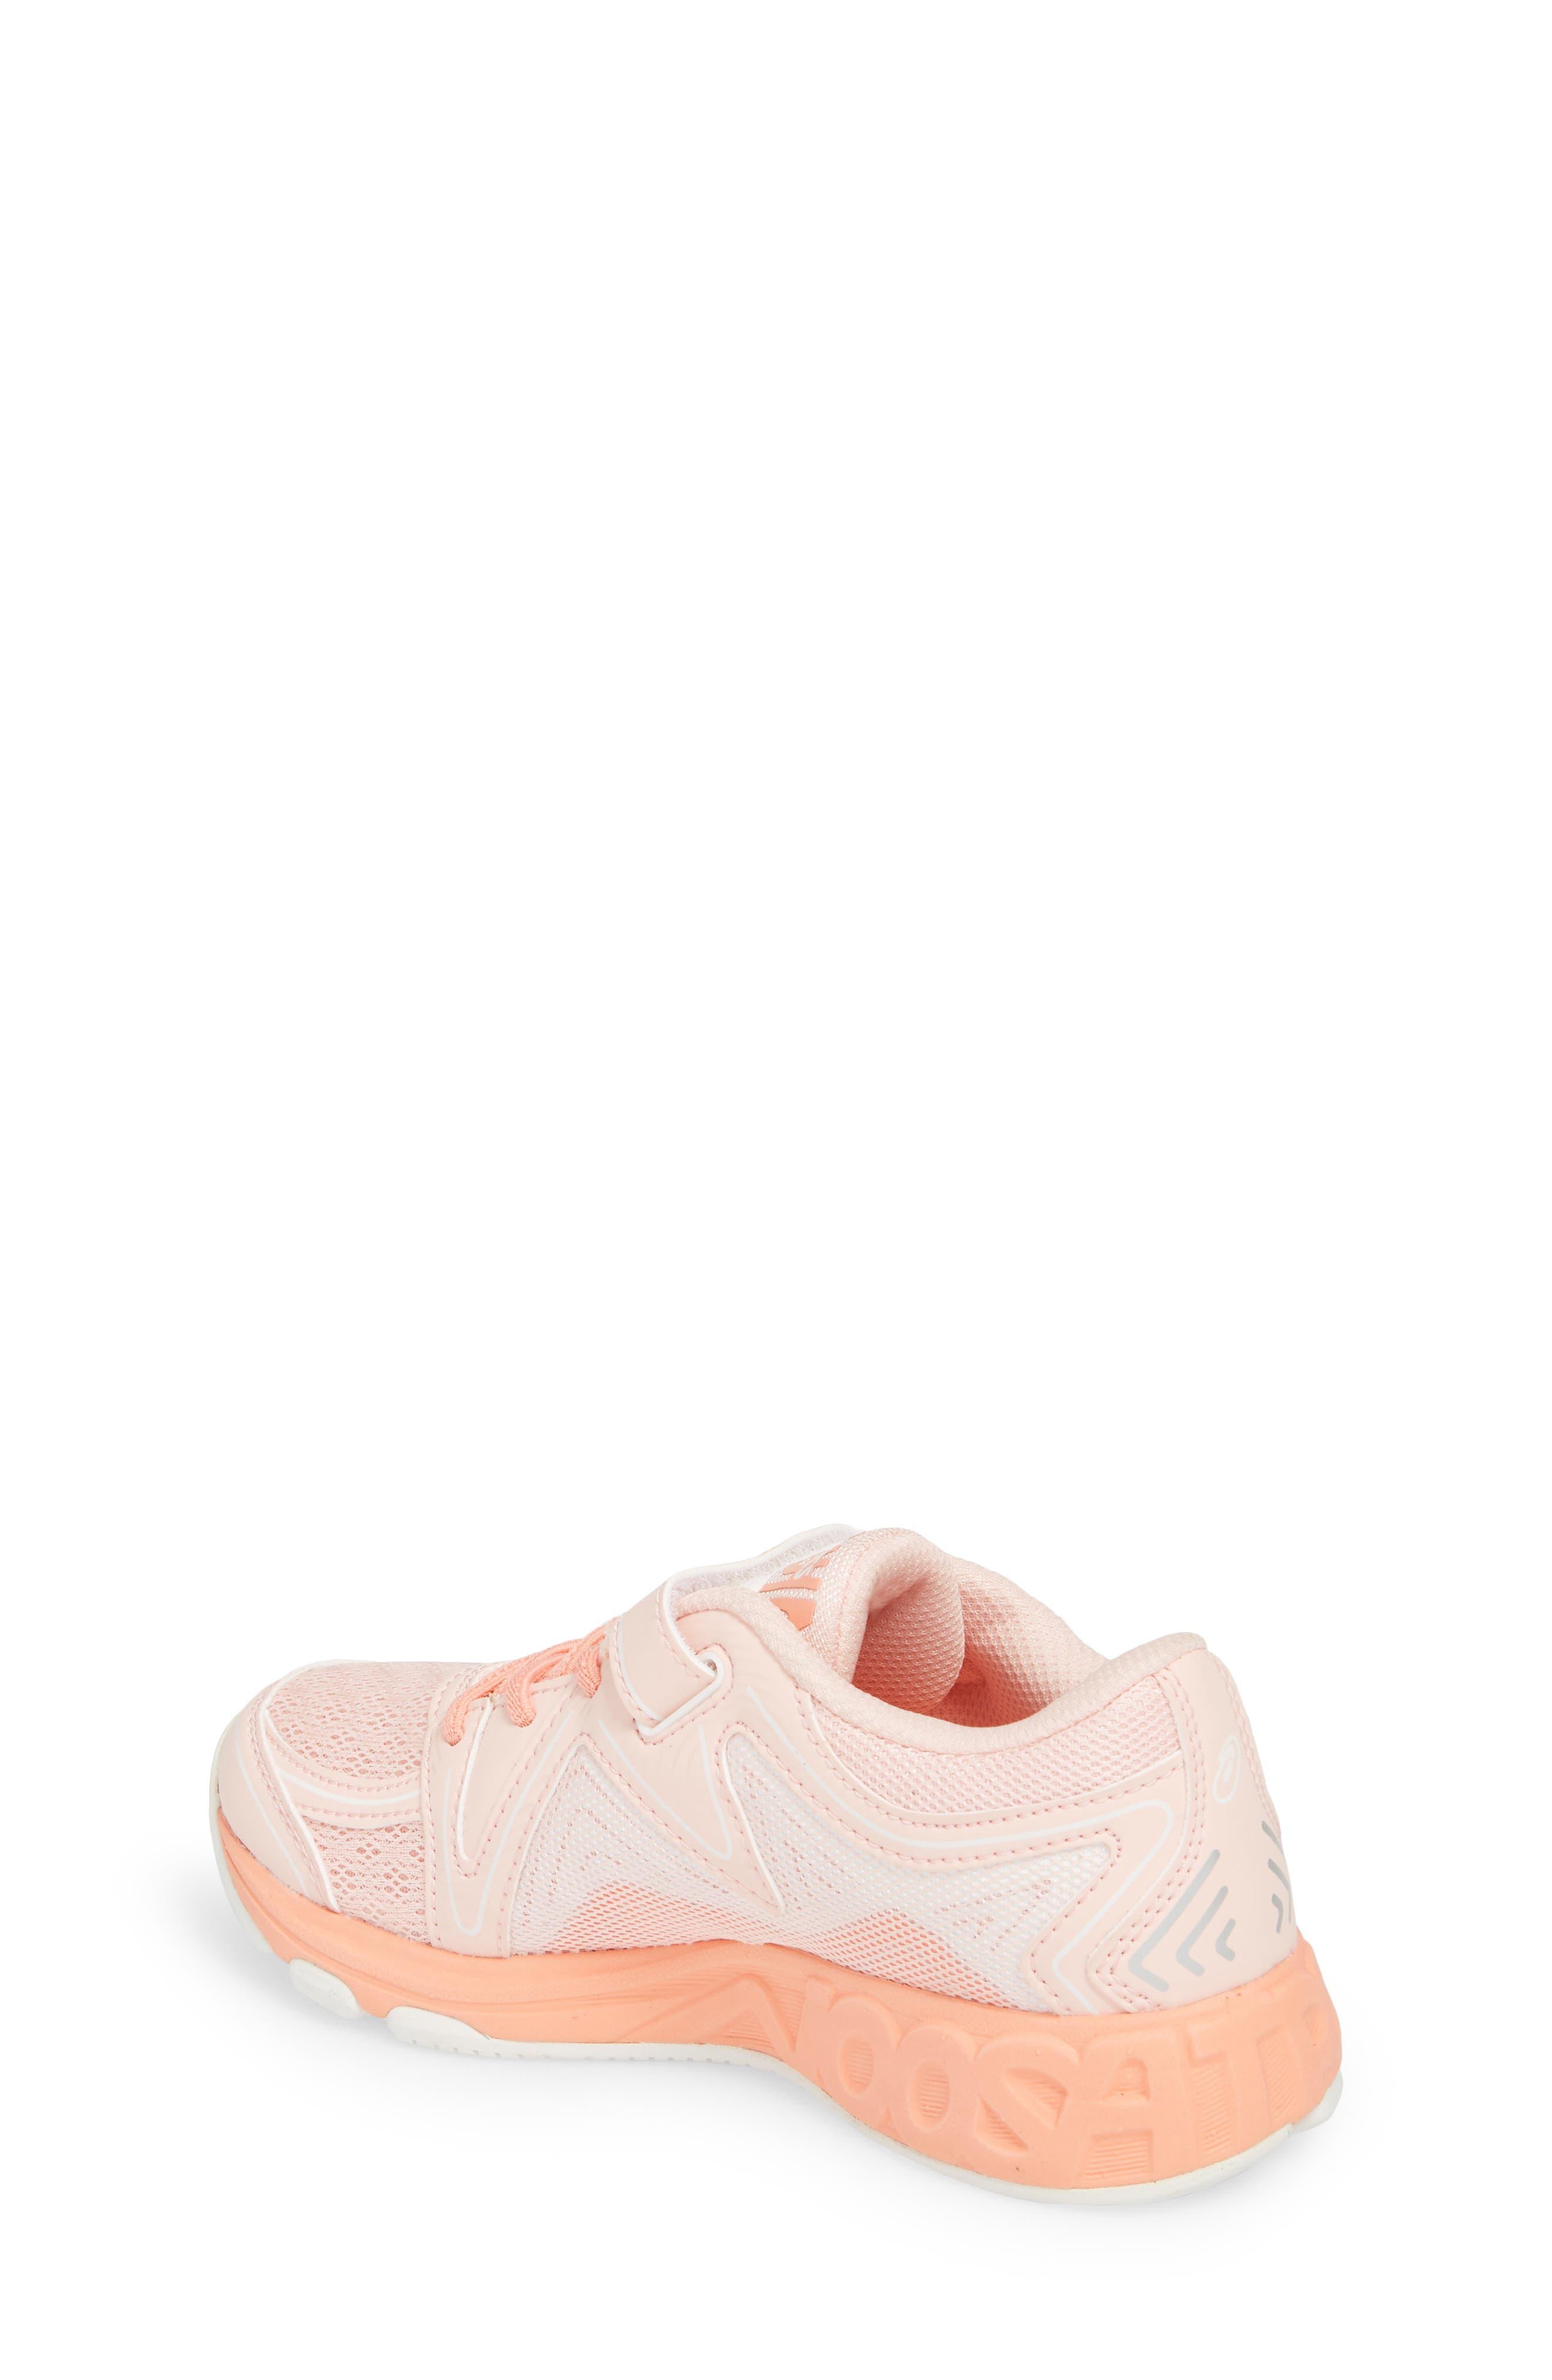 Noosa PS Sneaker,                             Alternate thumbnail 2, color,                             Seashell Pink/ Begonia/ White